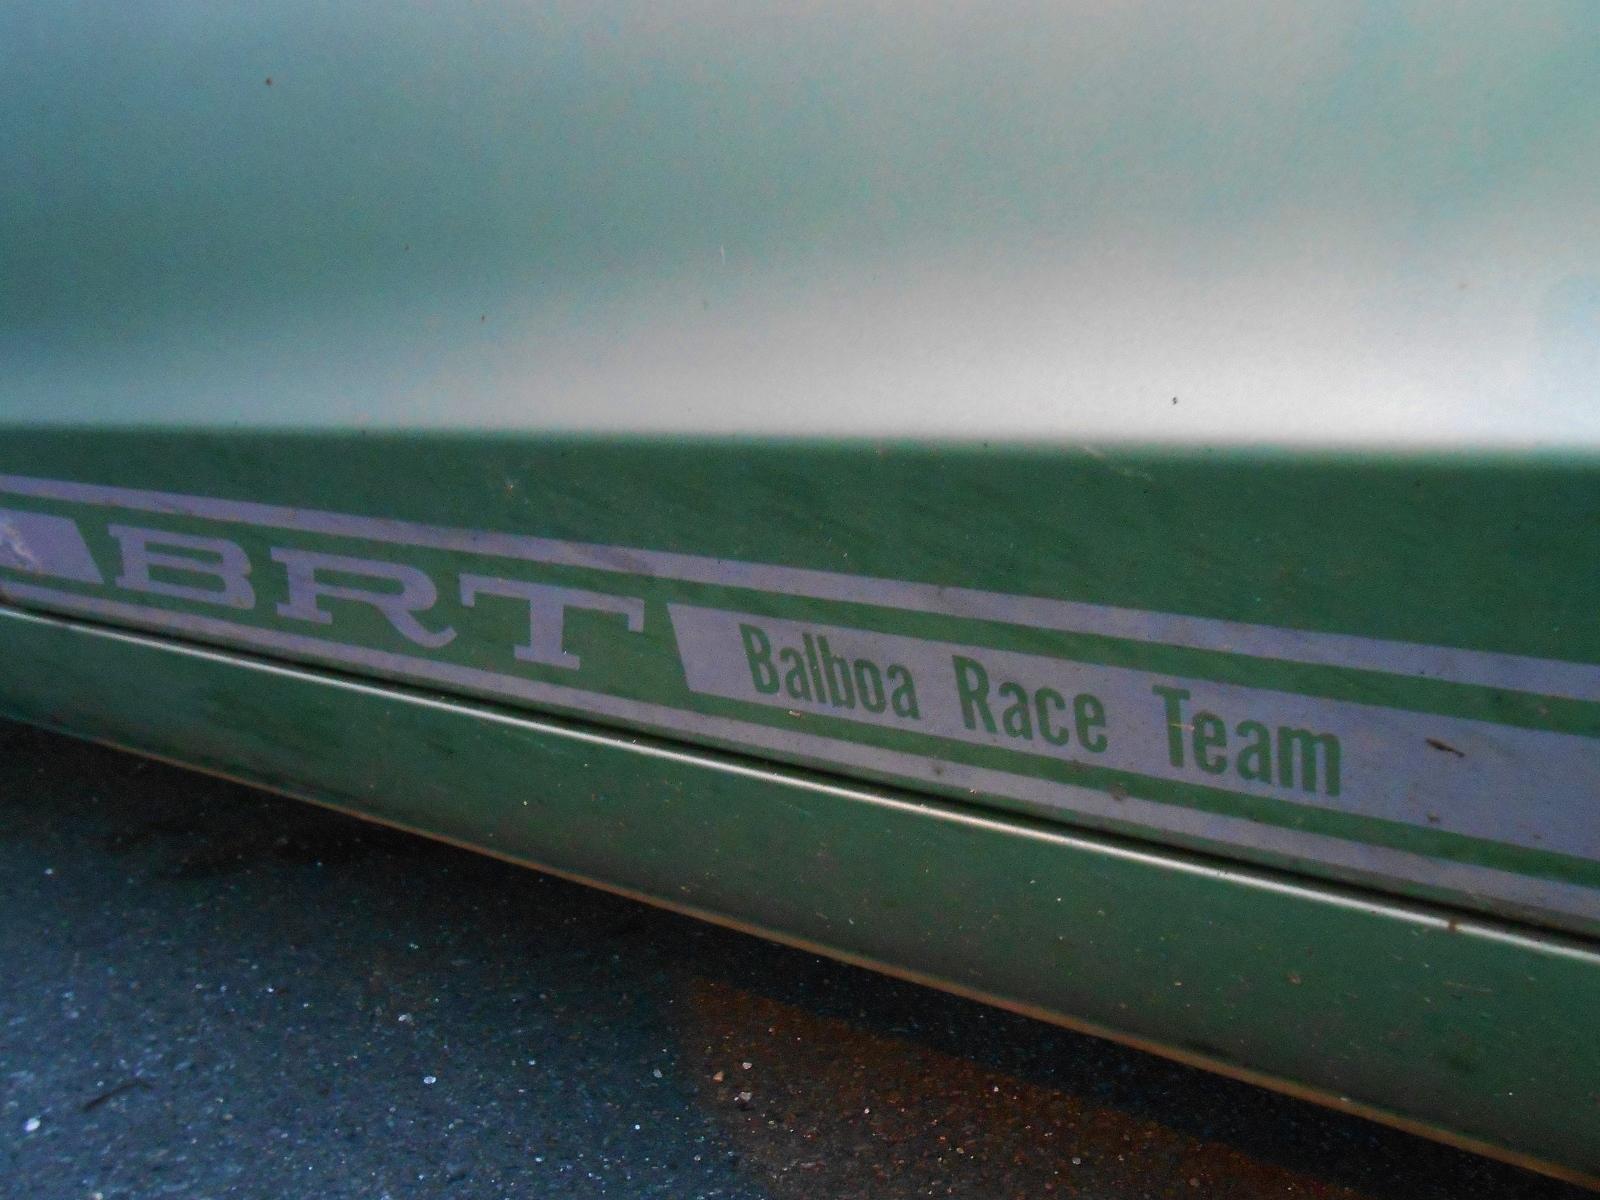 1977-Datsun-B210-Balboa-Race-Team-Coupe-